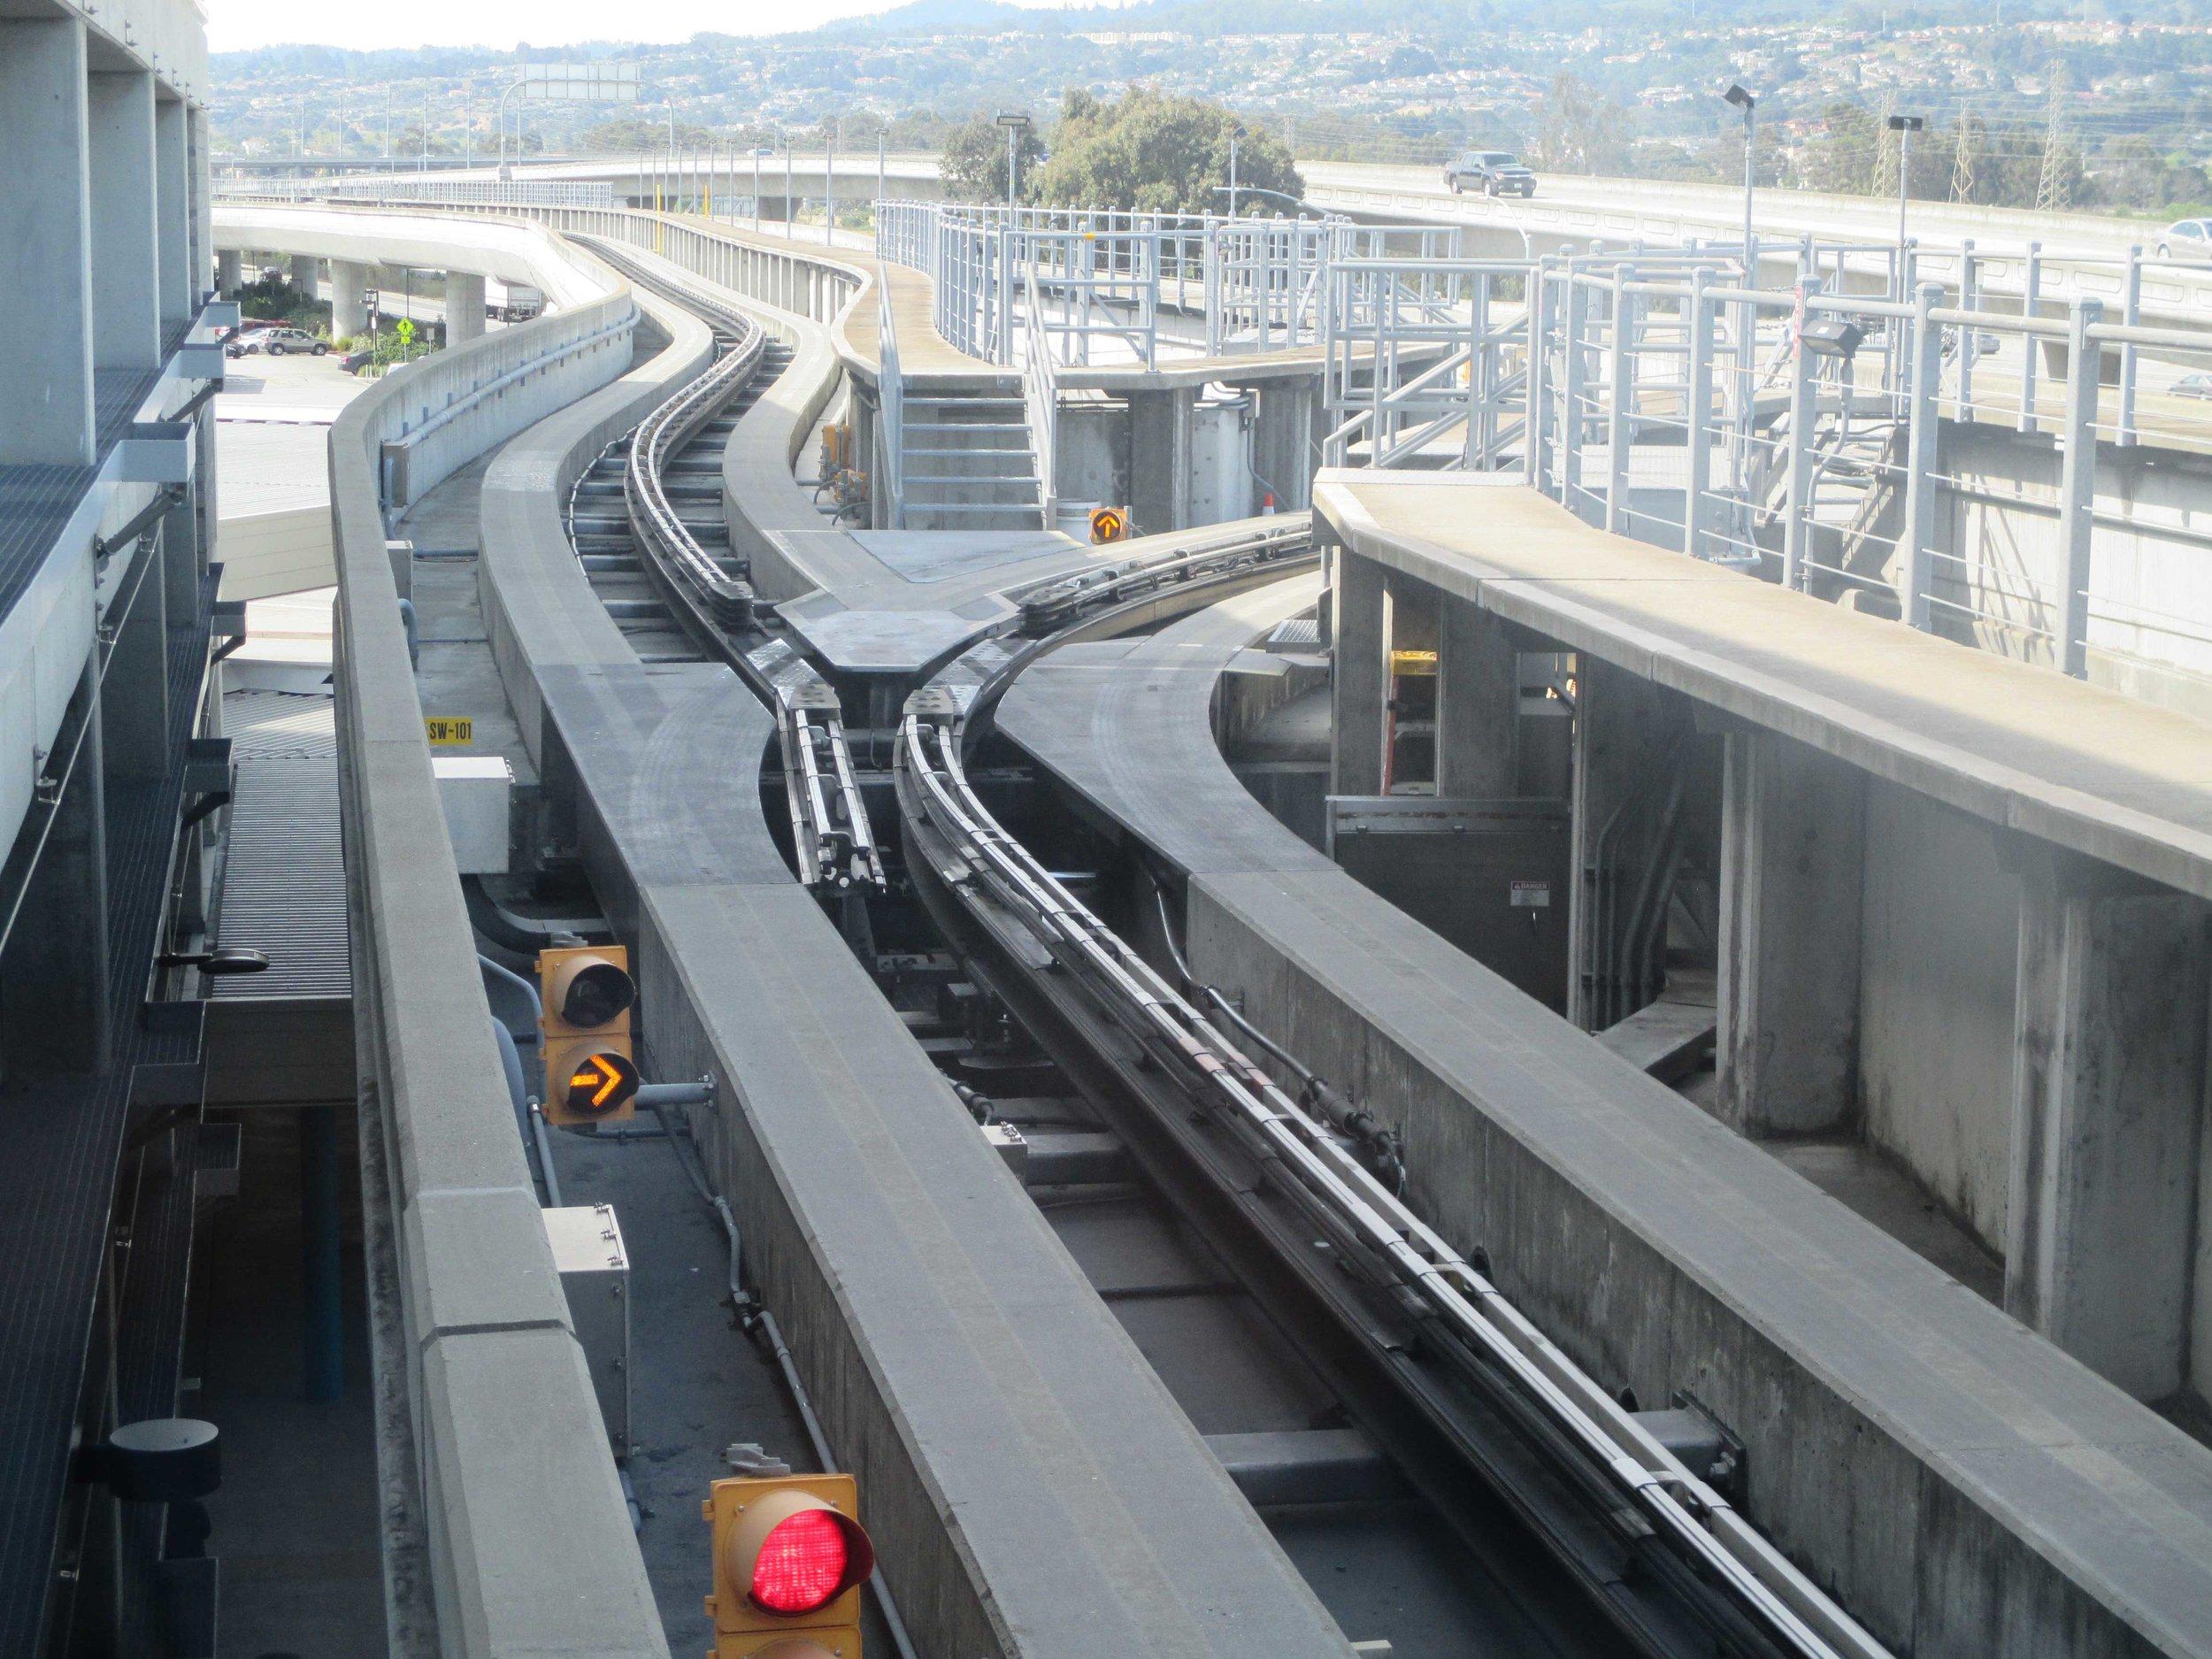 aldridge-electric-top-transportation-infrastructure-contractors-transit-airport-people-movers.jpg